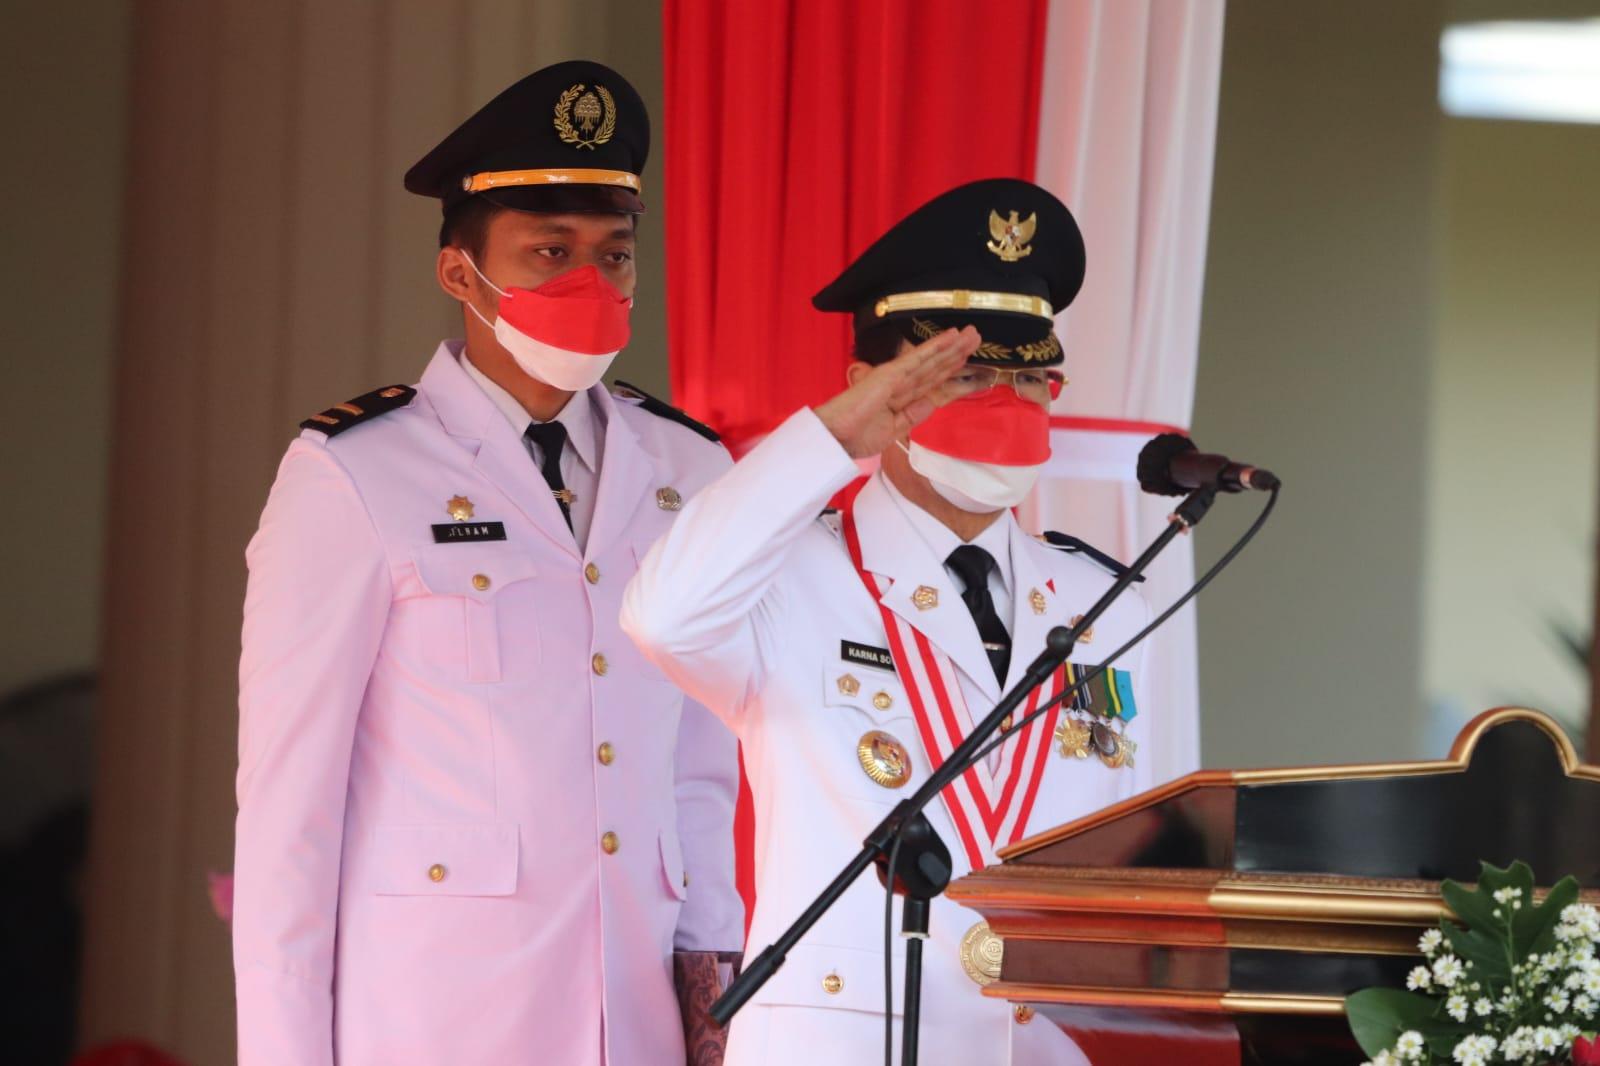 Upacara Peringatan HUT Kemerdekaan Republik Indonesia ke-76 tahun 2021 di Lingkungan Pemkab Majaleng